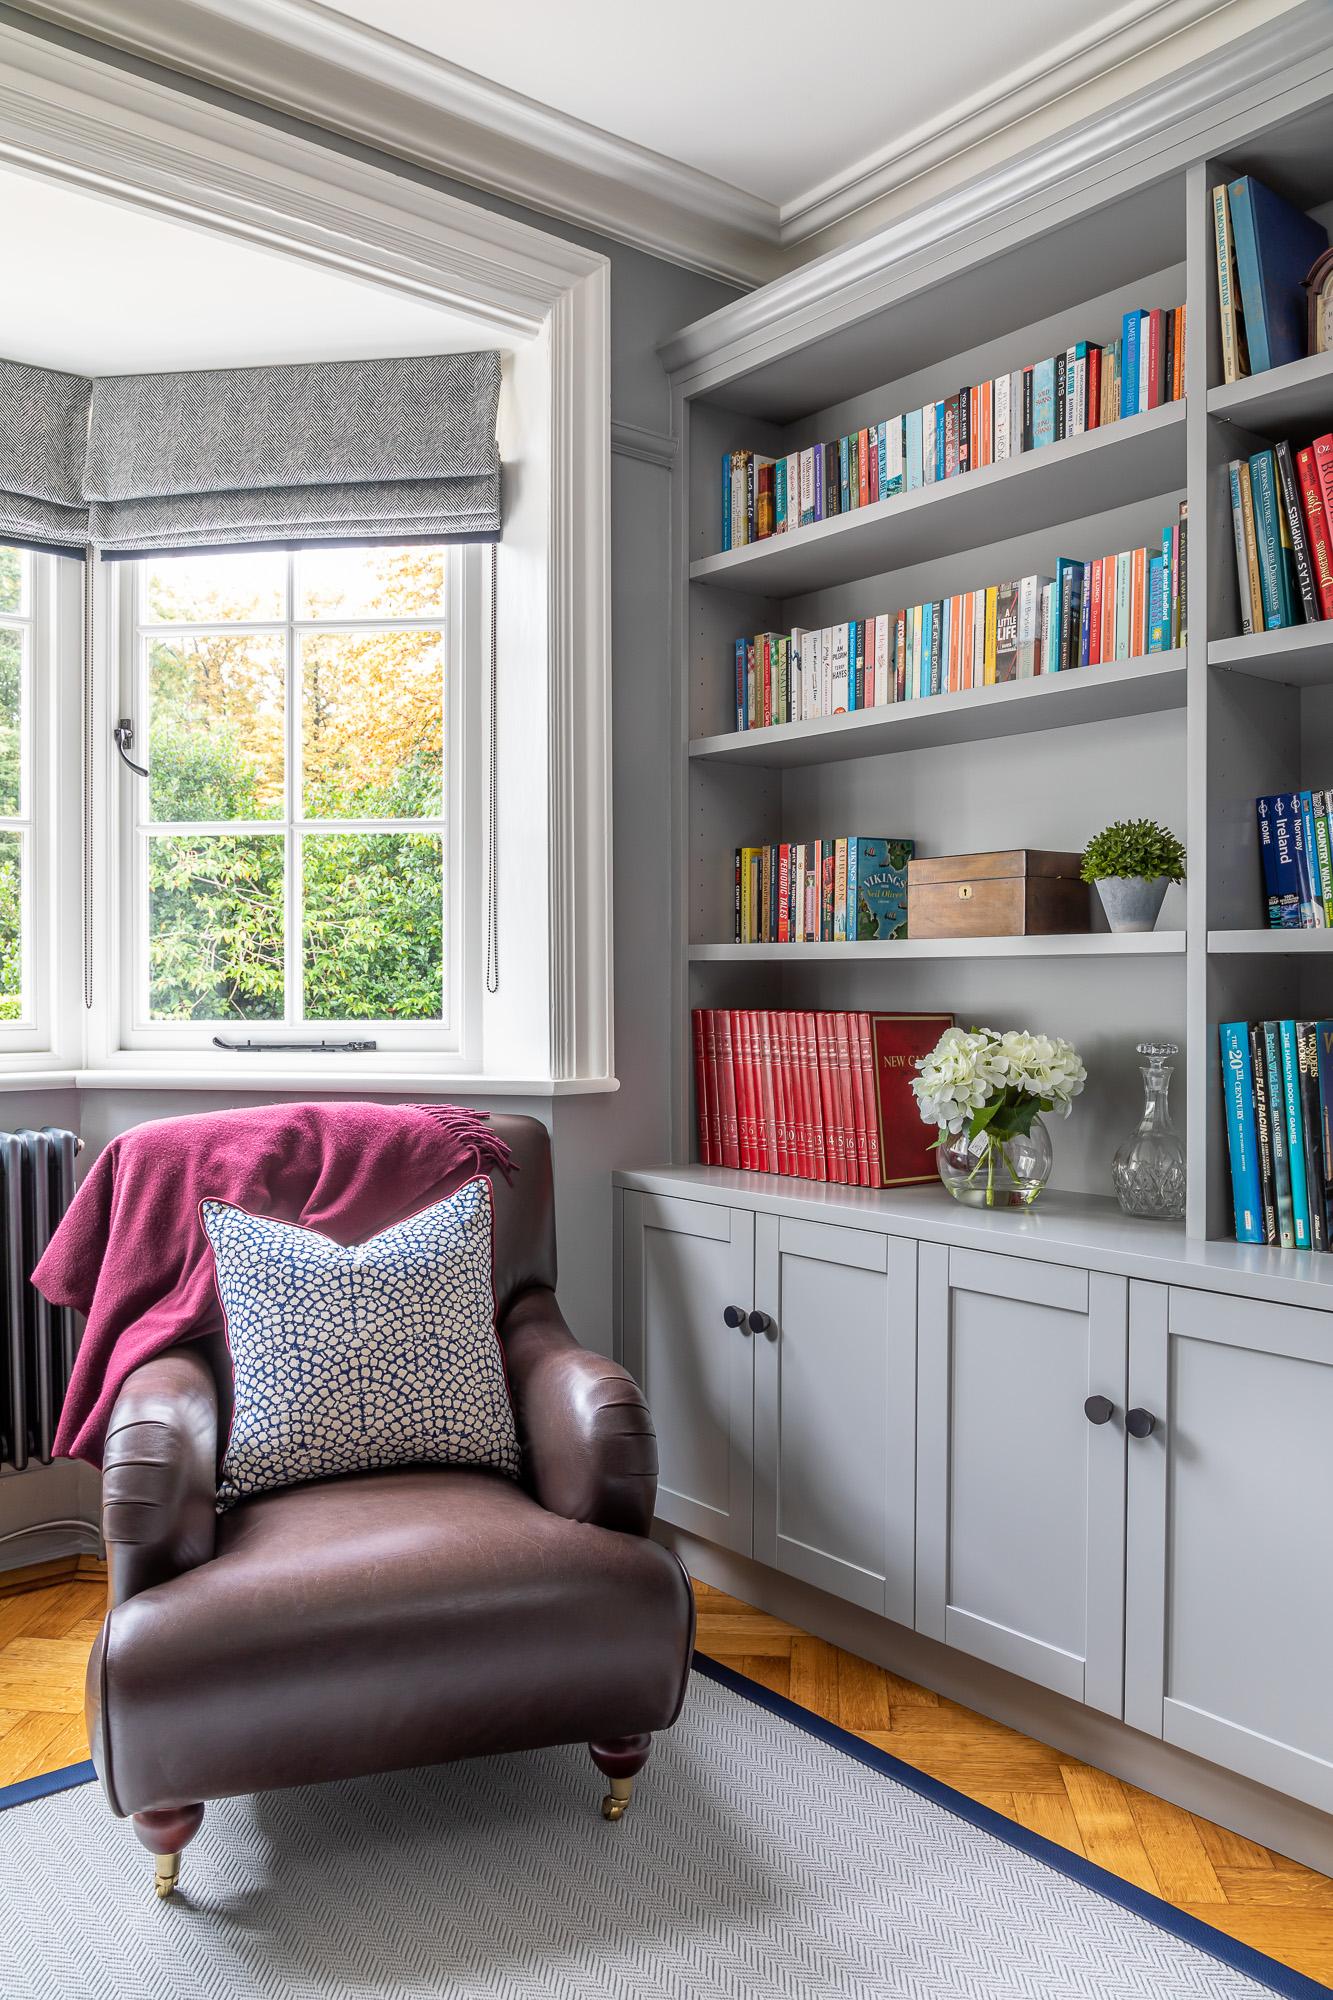 jonathan bond, interior photographer, leather armchair in study, great missenden, buckinghamshire